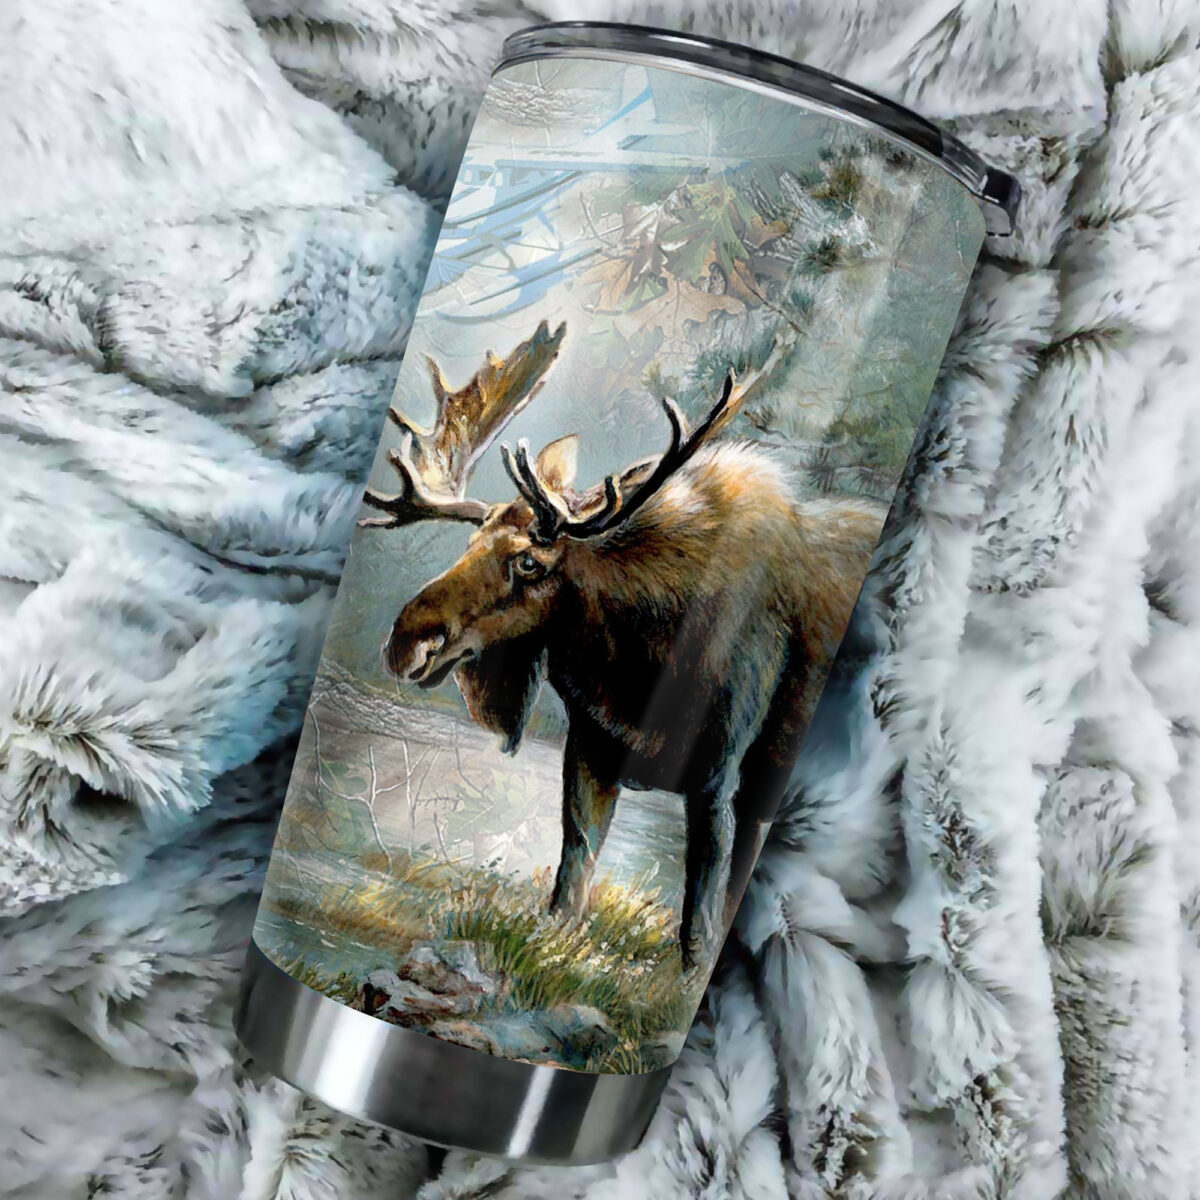 moose hunting season all over print stainless steel tumbler 3